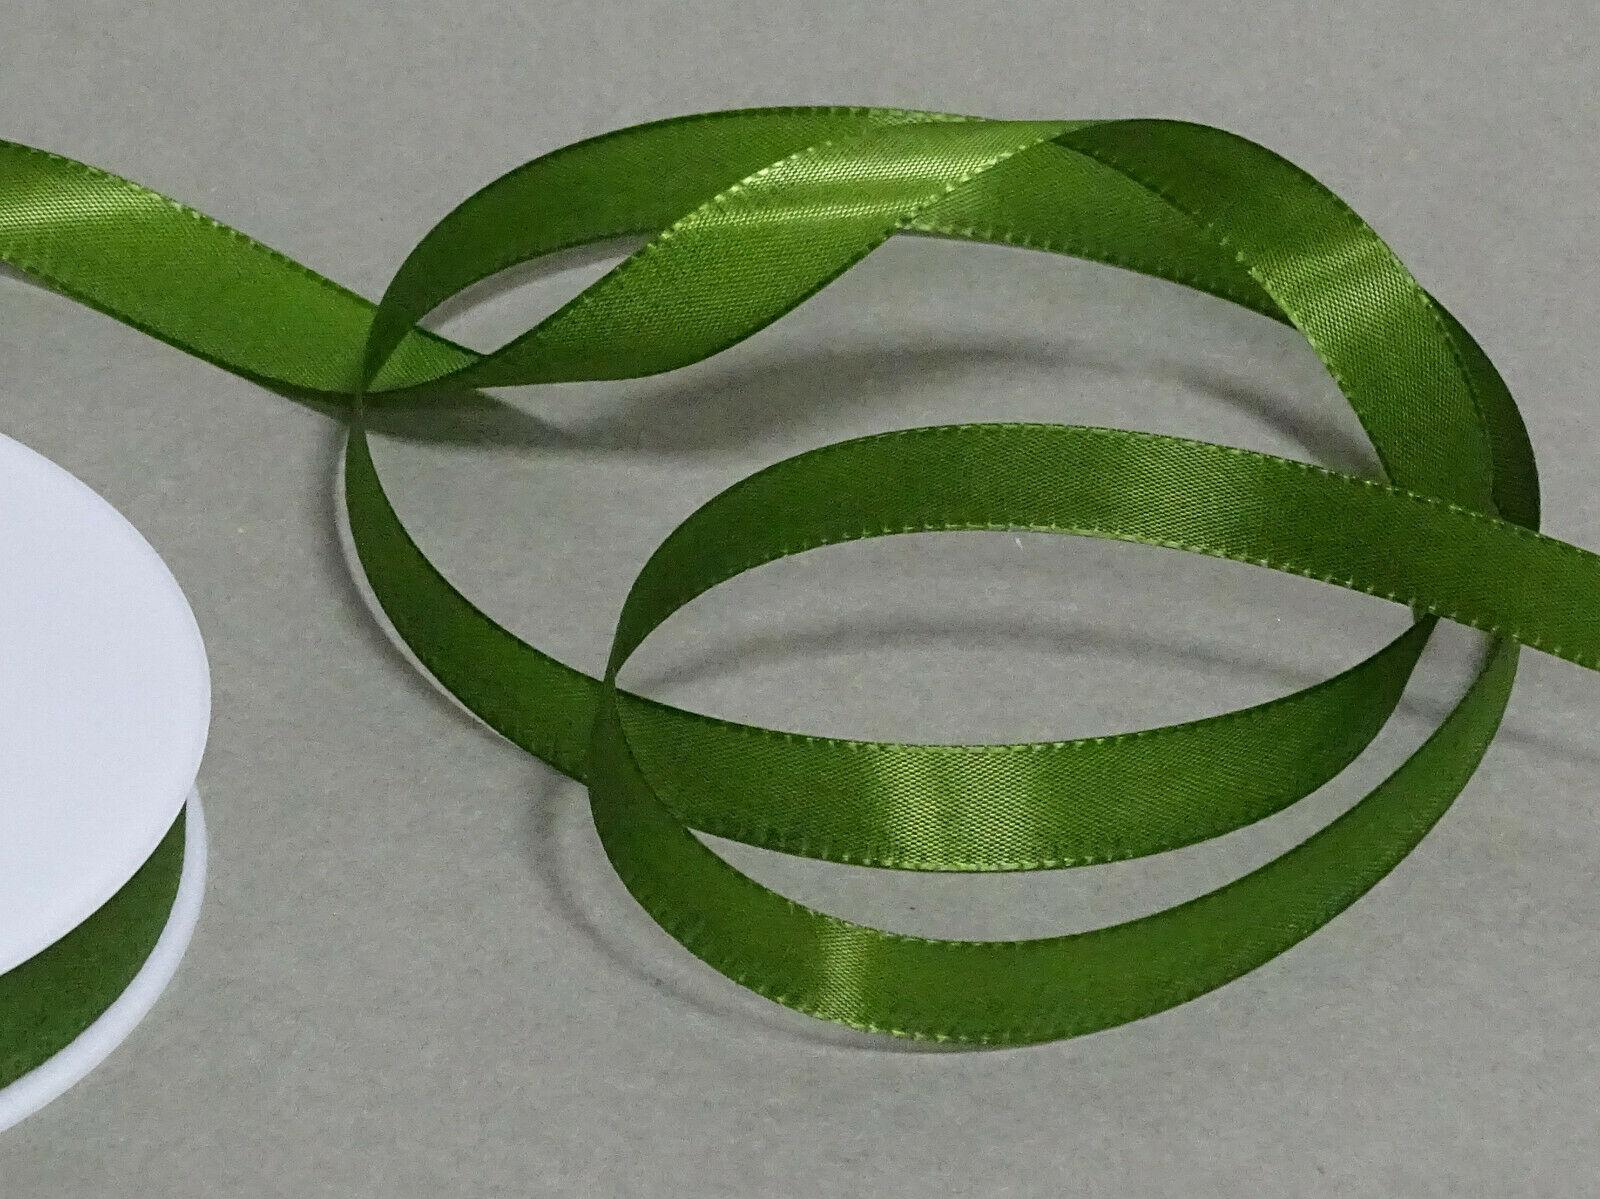 Seidenband Schleifenband 50 m x 15 mm / 40 mm Dekoband ab 0,08 €/m Geschenkband  - Olivgrün 111, 15 mm x 50 m